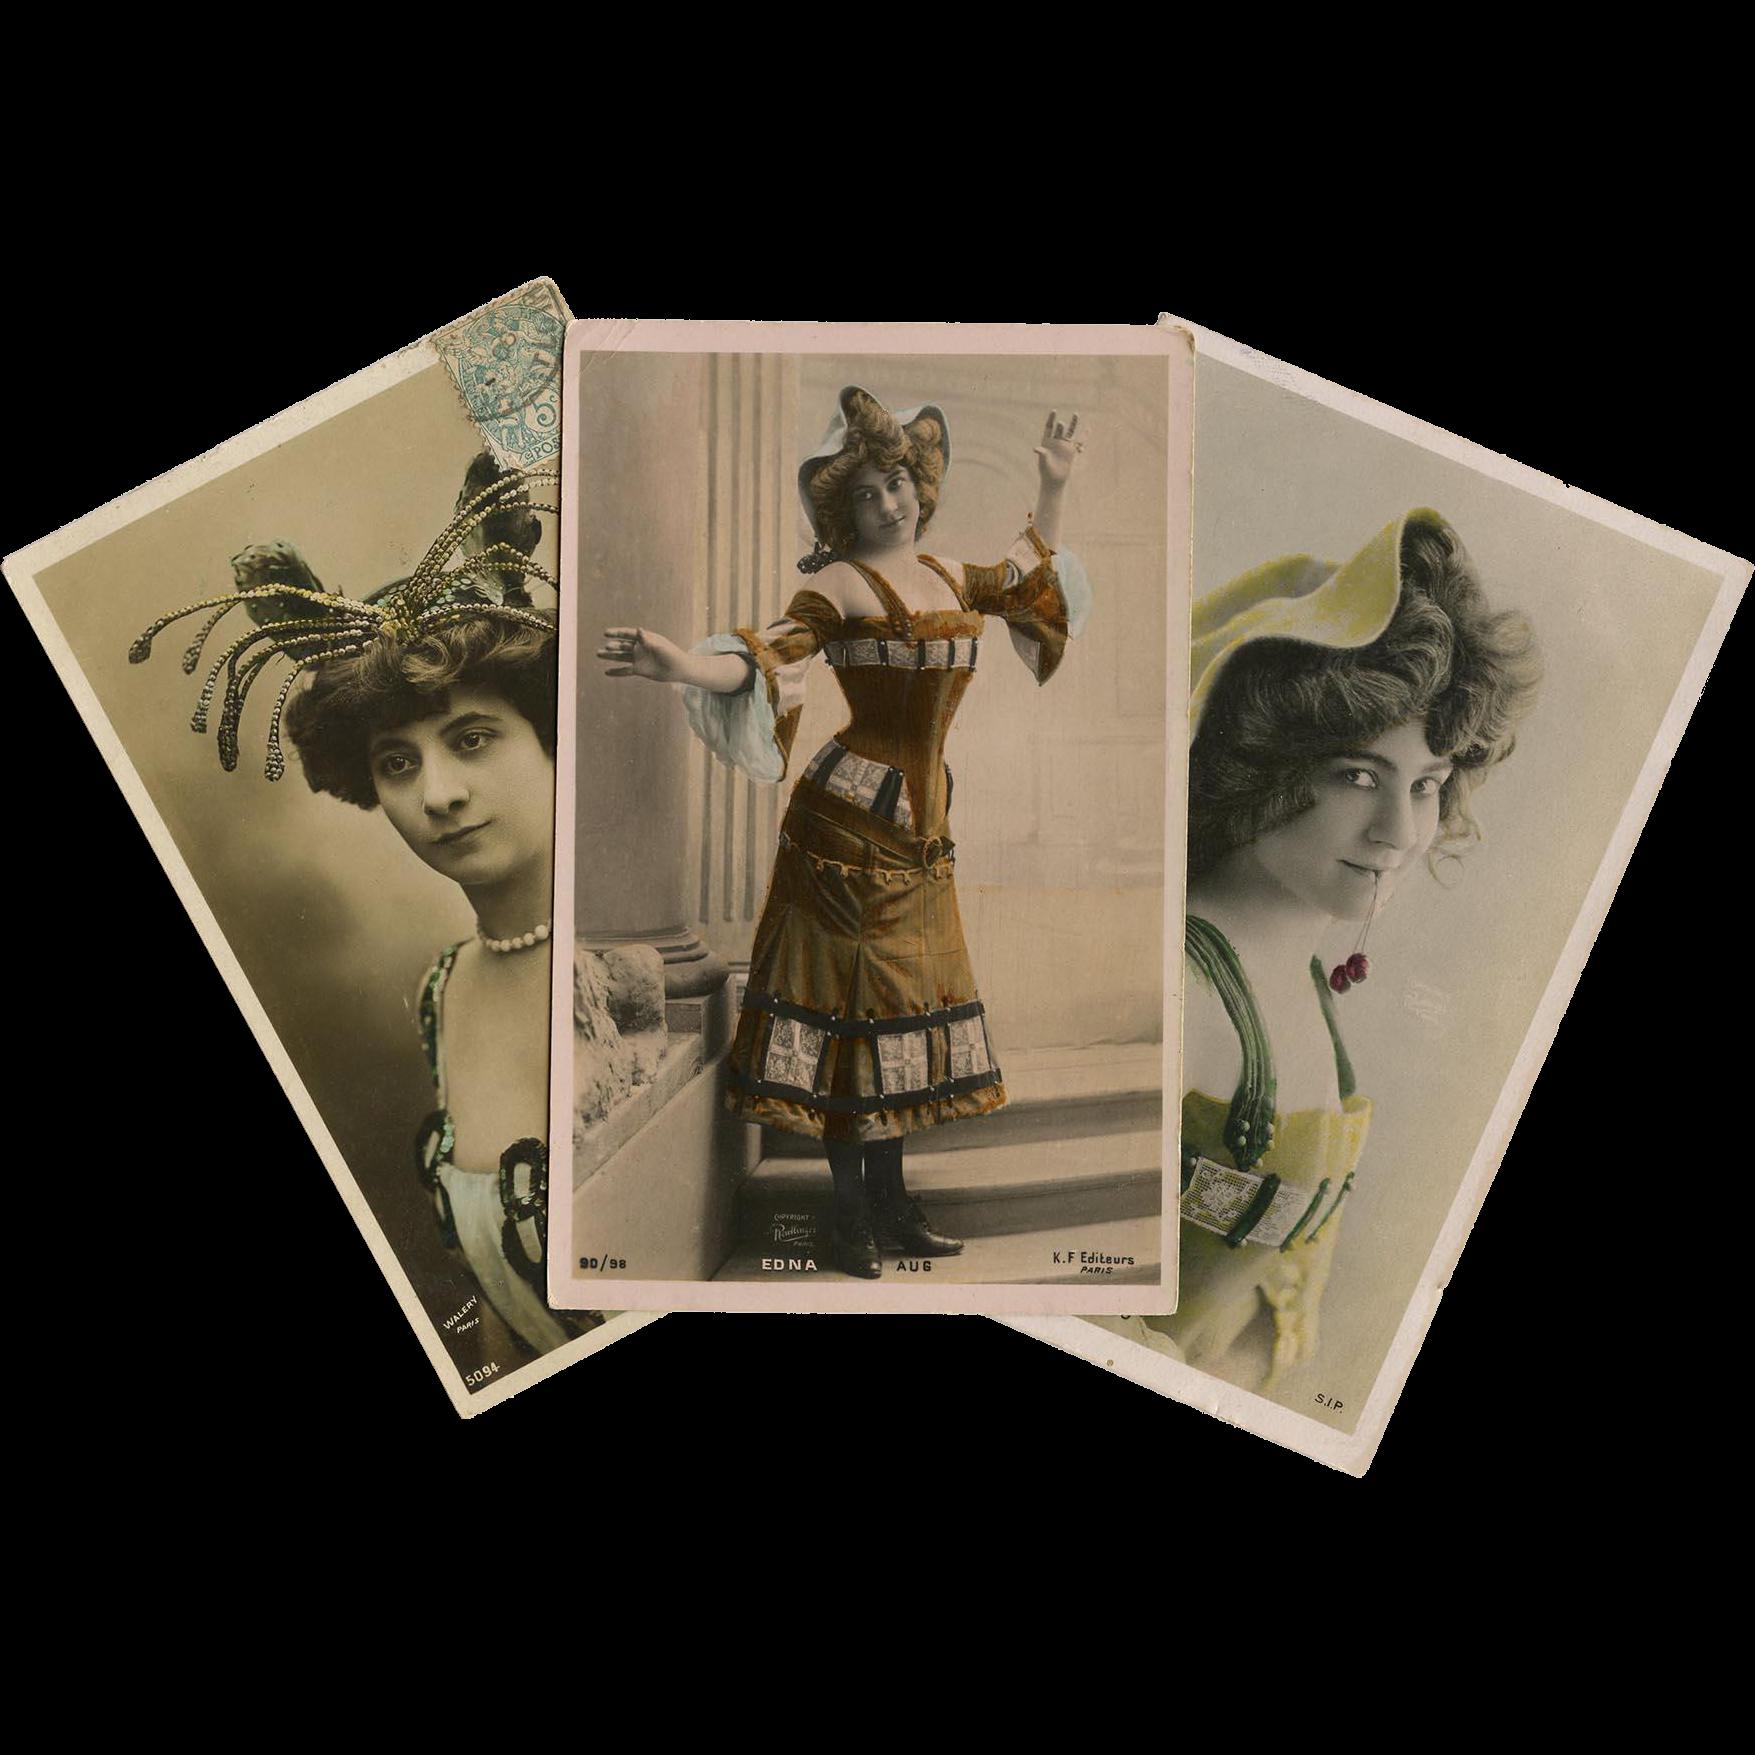 3 Belle Epoque Actress Real Photo Postcards Reutlinger and Walery of Paris